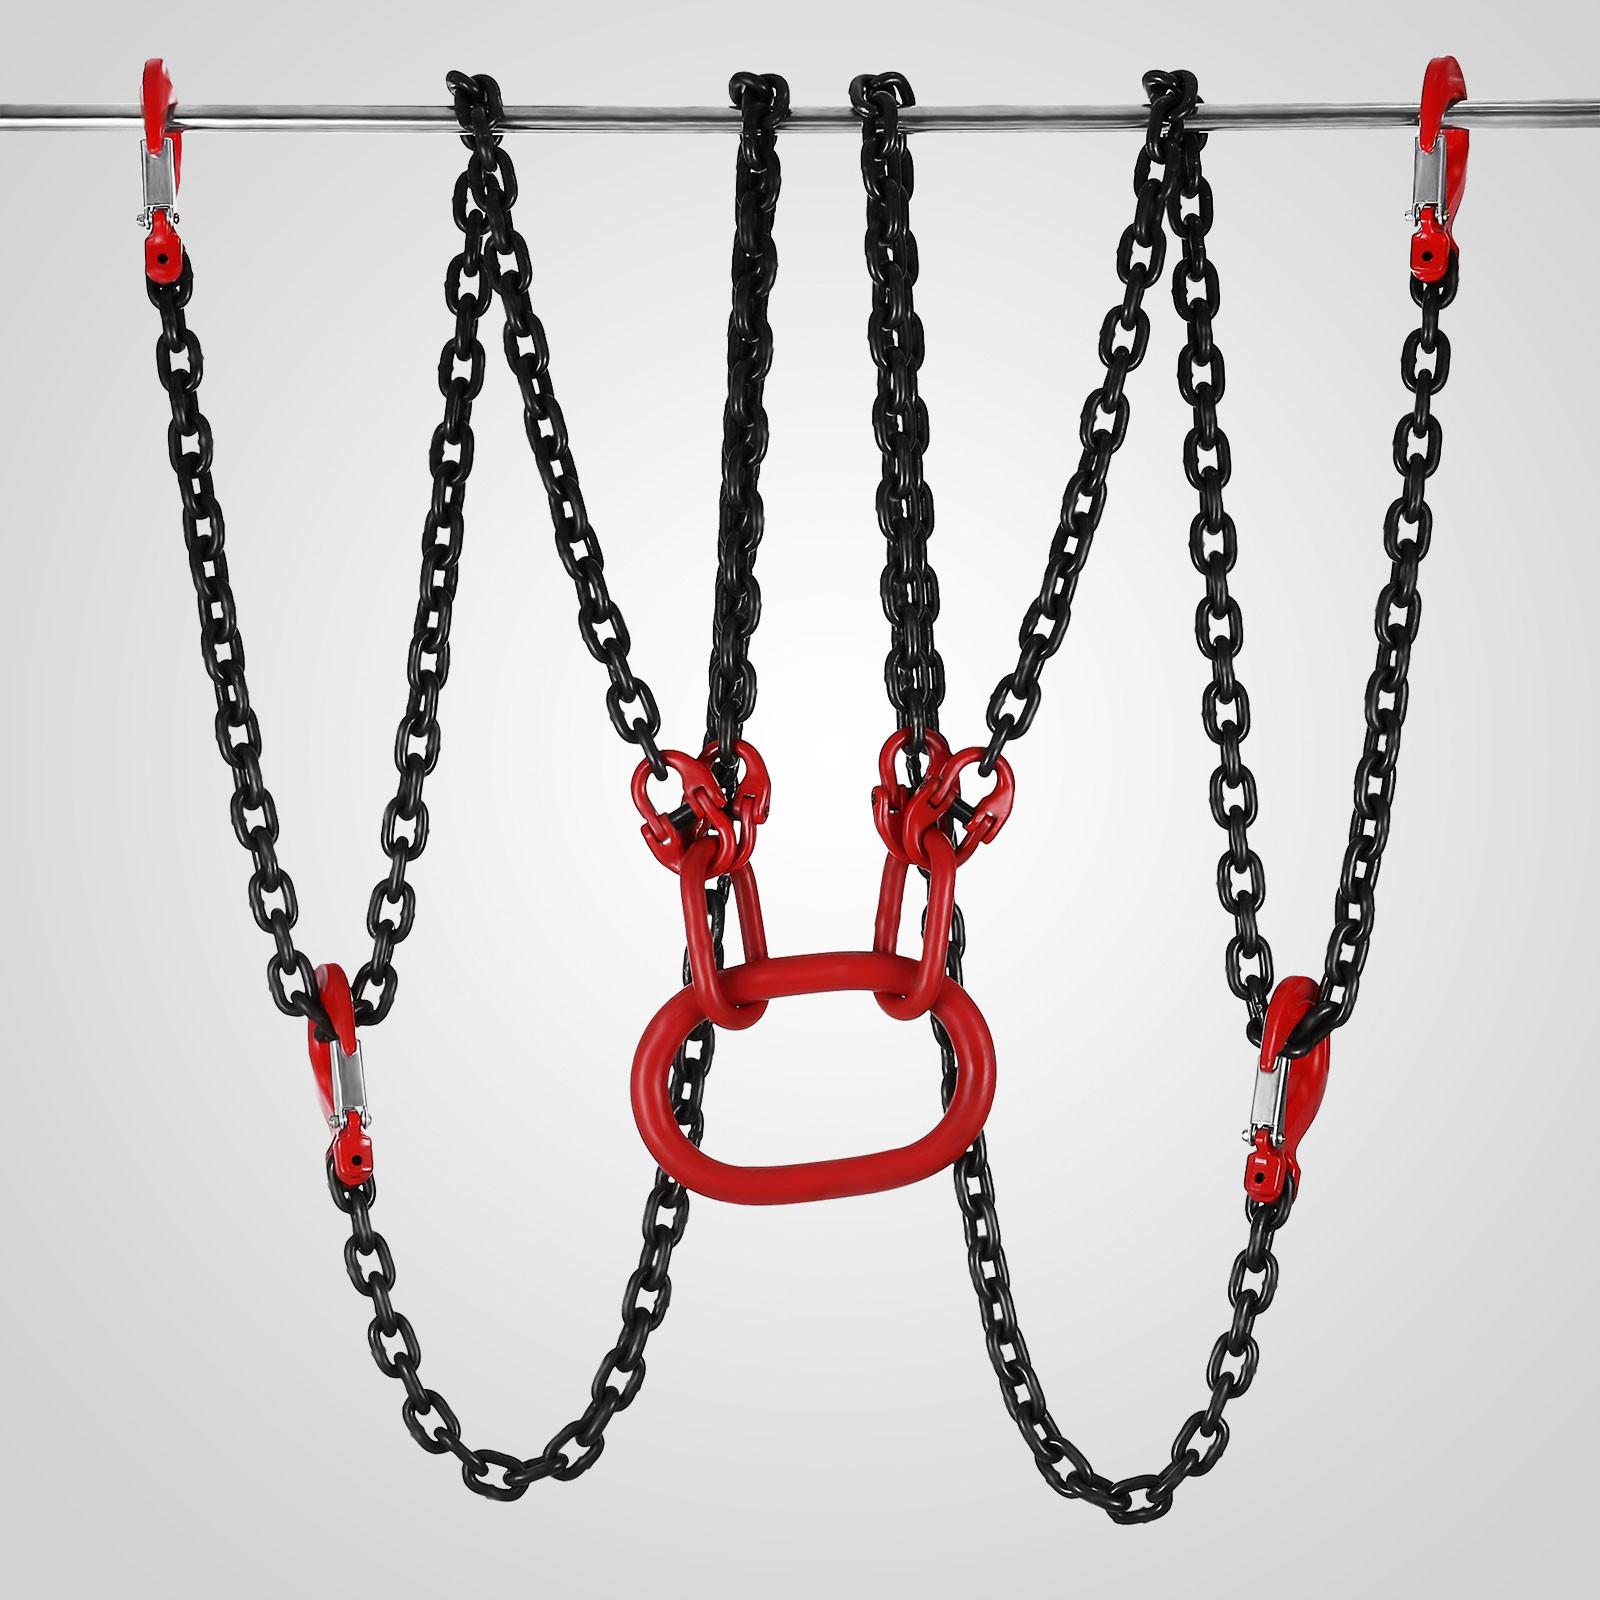 1.5//3//4M Lifting Chain Sling Lifts 5 Ton Forging Trap 1.5M 4:1 High Efficienty